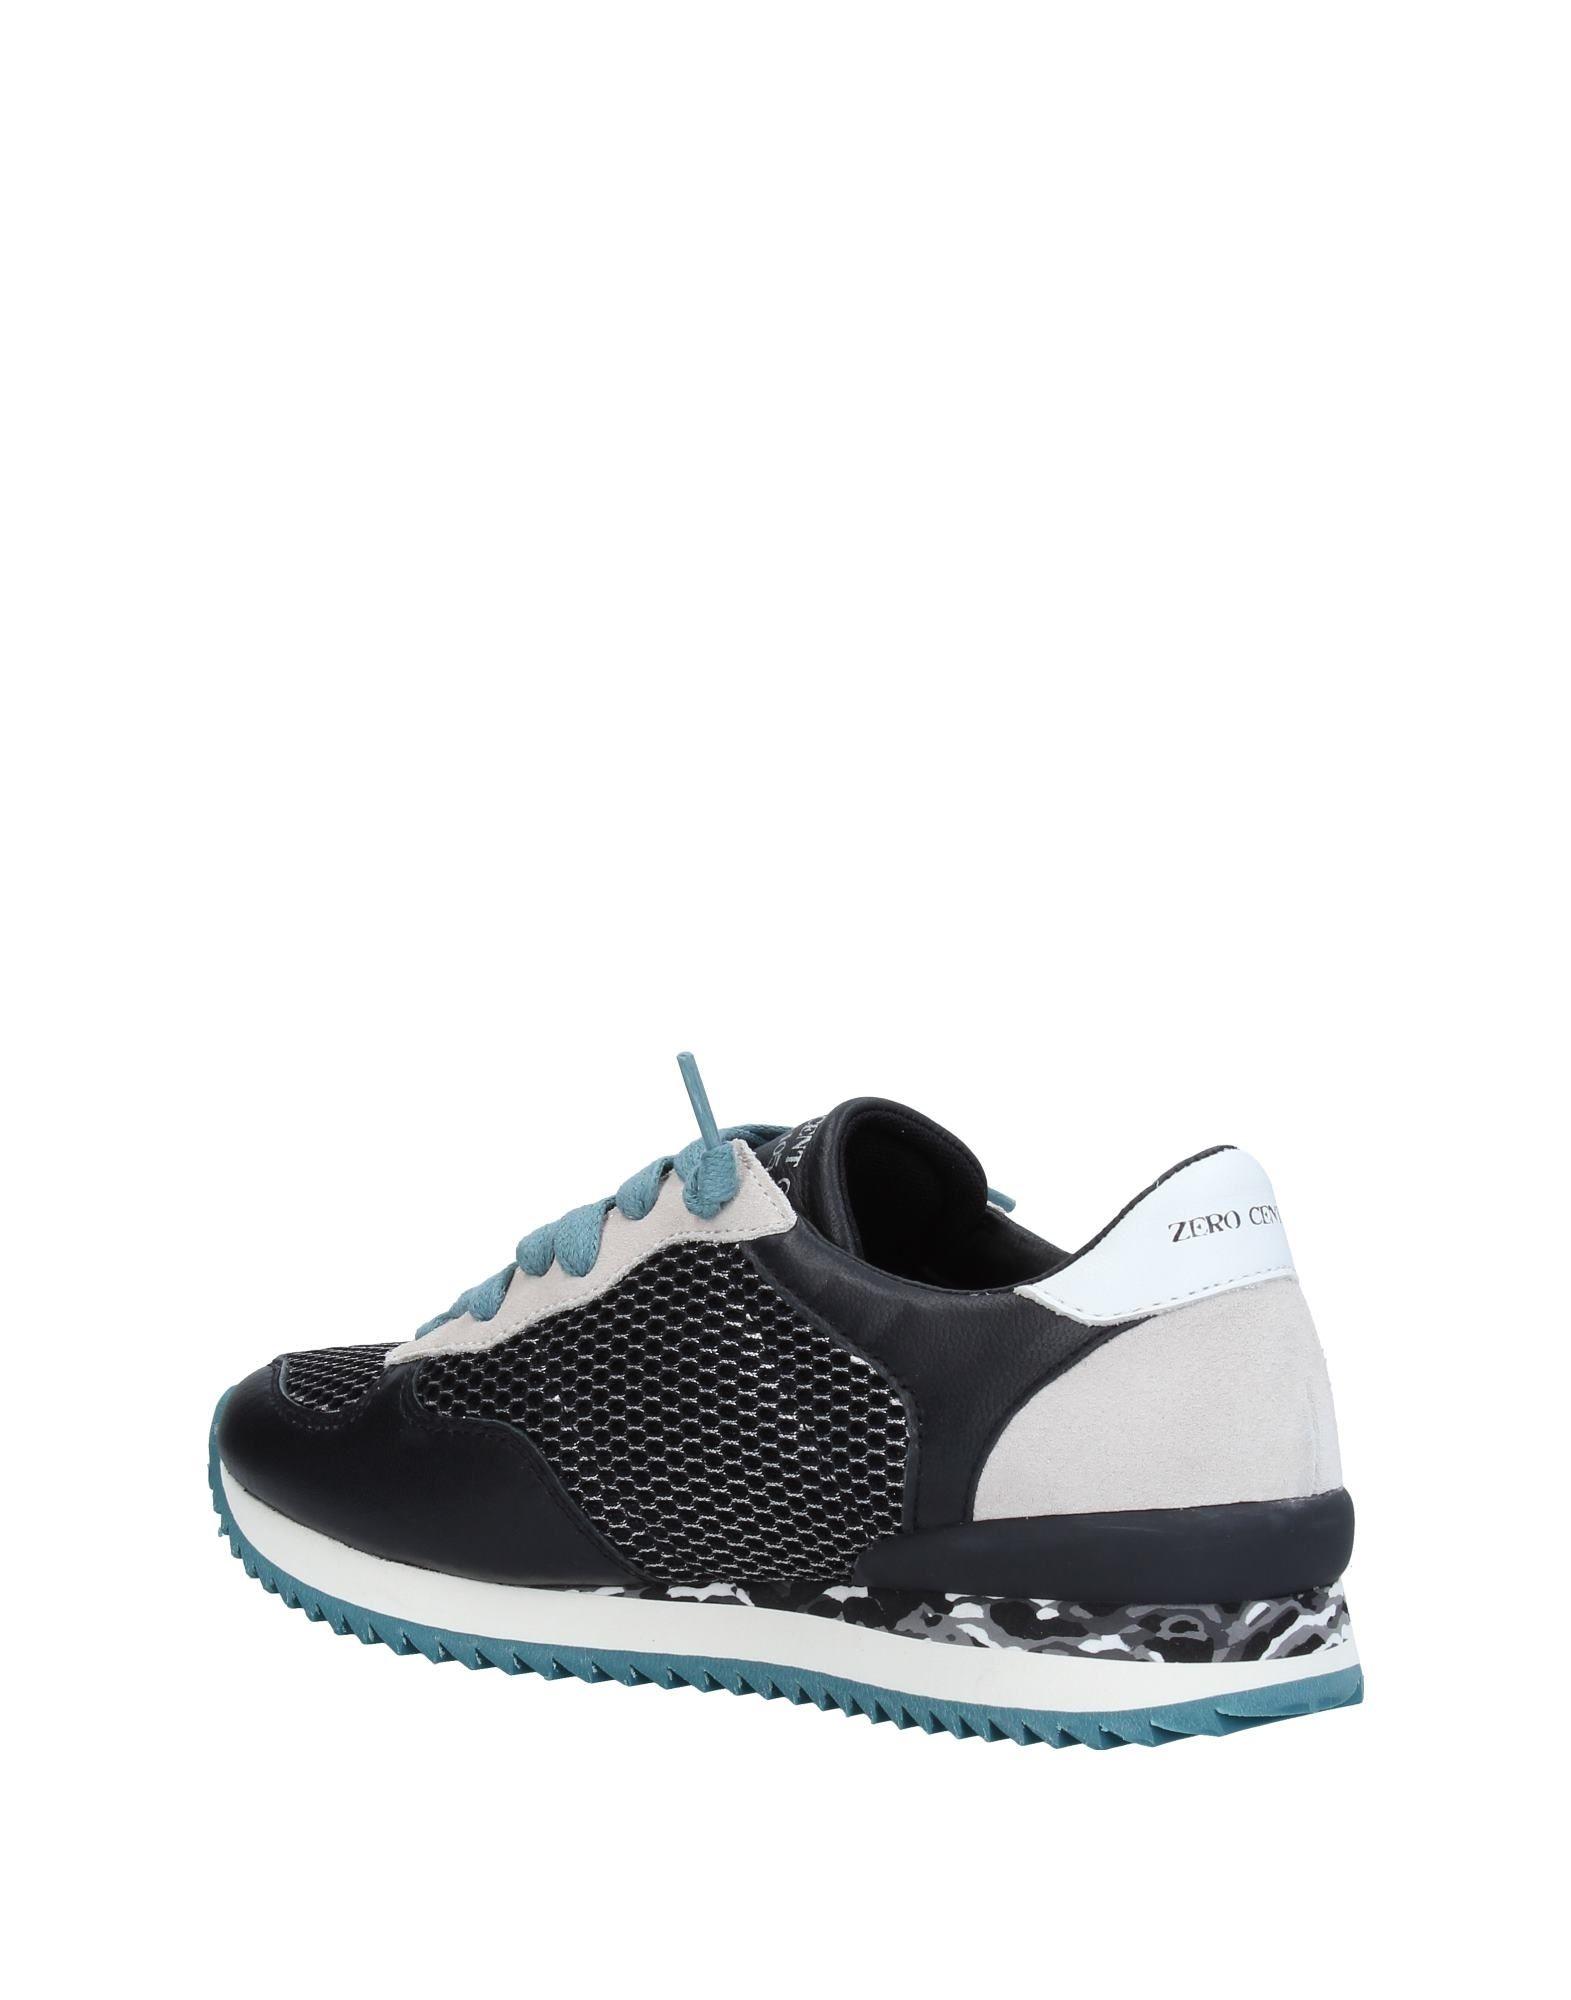 Sneakers 0-105 Zero Cent Cinq Femme - Sneakers 0-105 Zero Cent Cinq sur